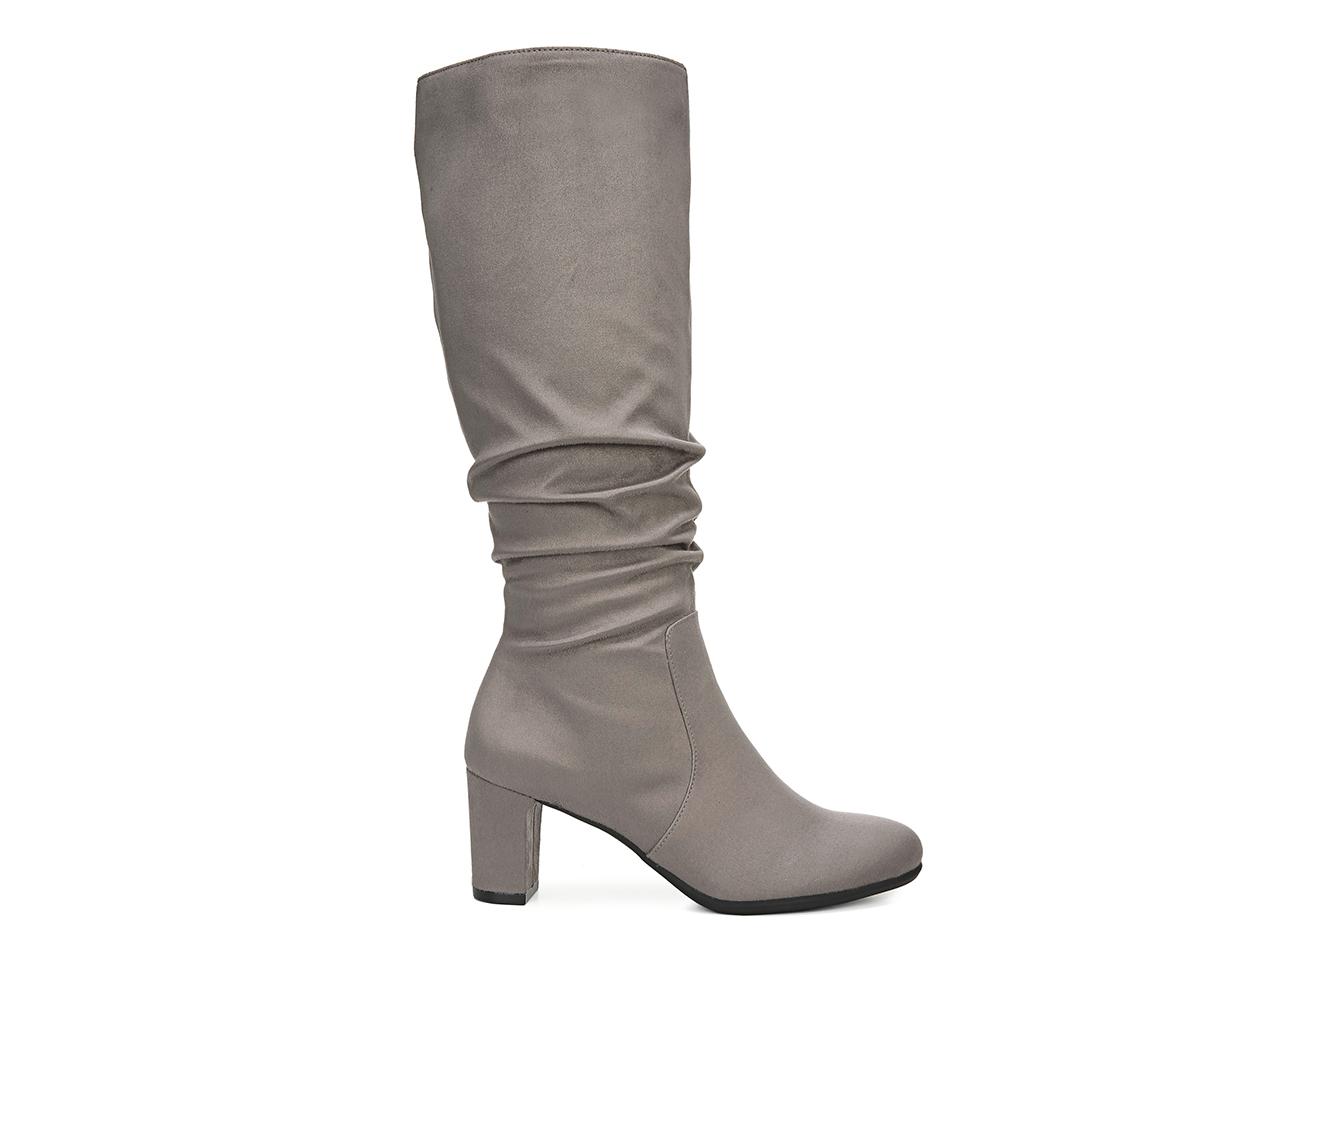 LifeStride Maltese Women's Boots (Gray - Canvas)